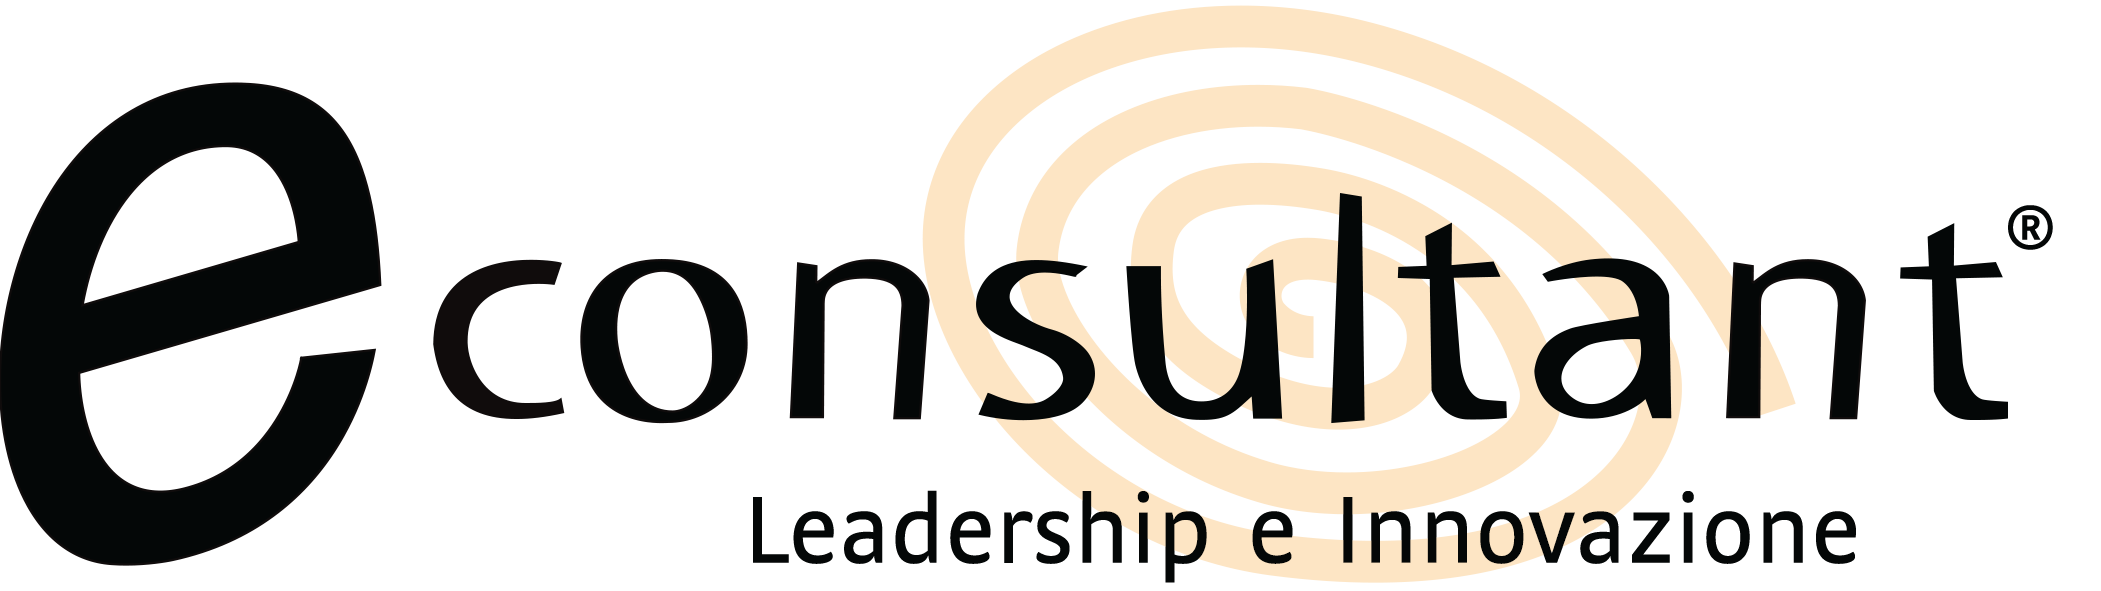 Logo econsultant